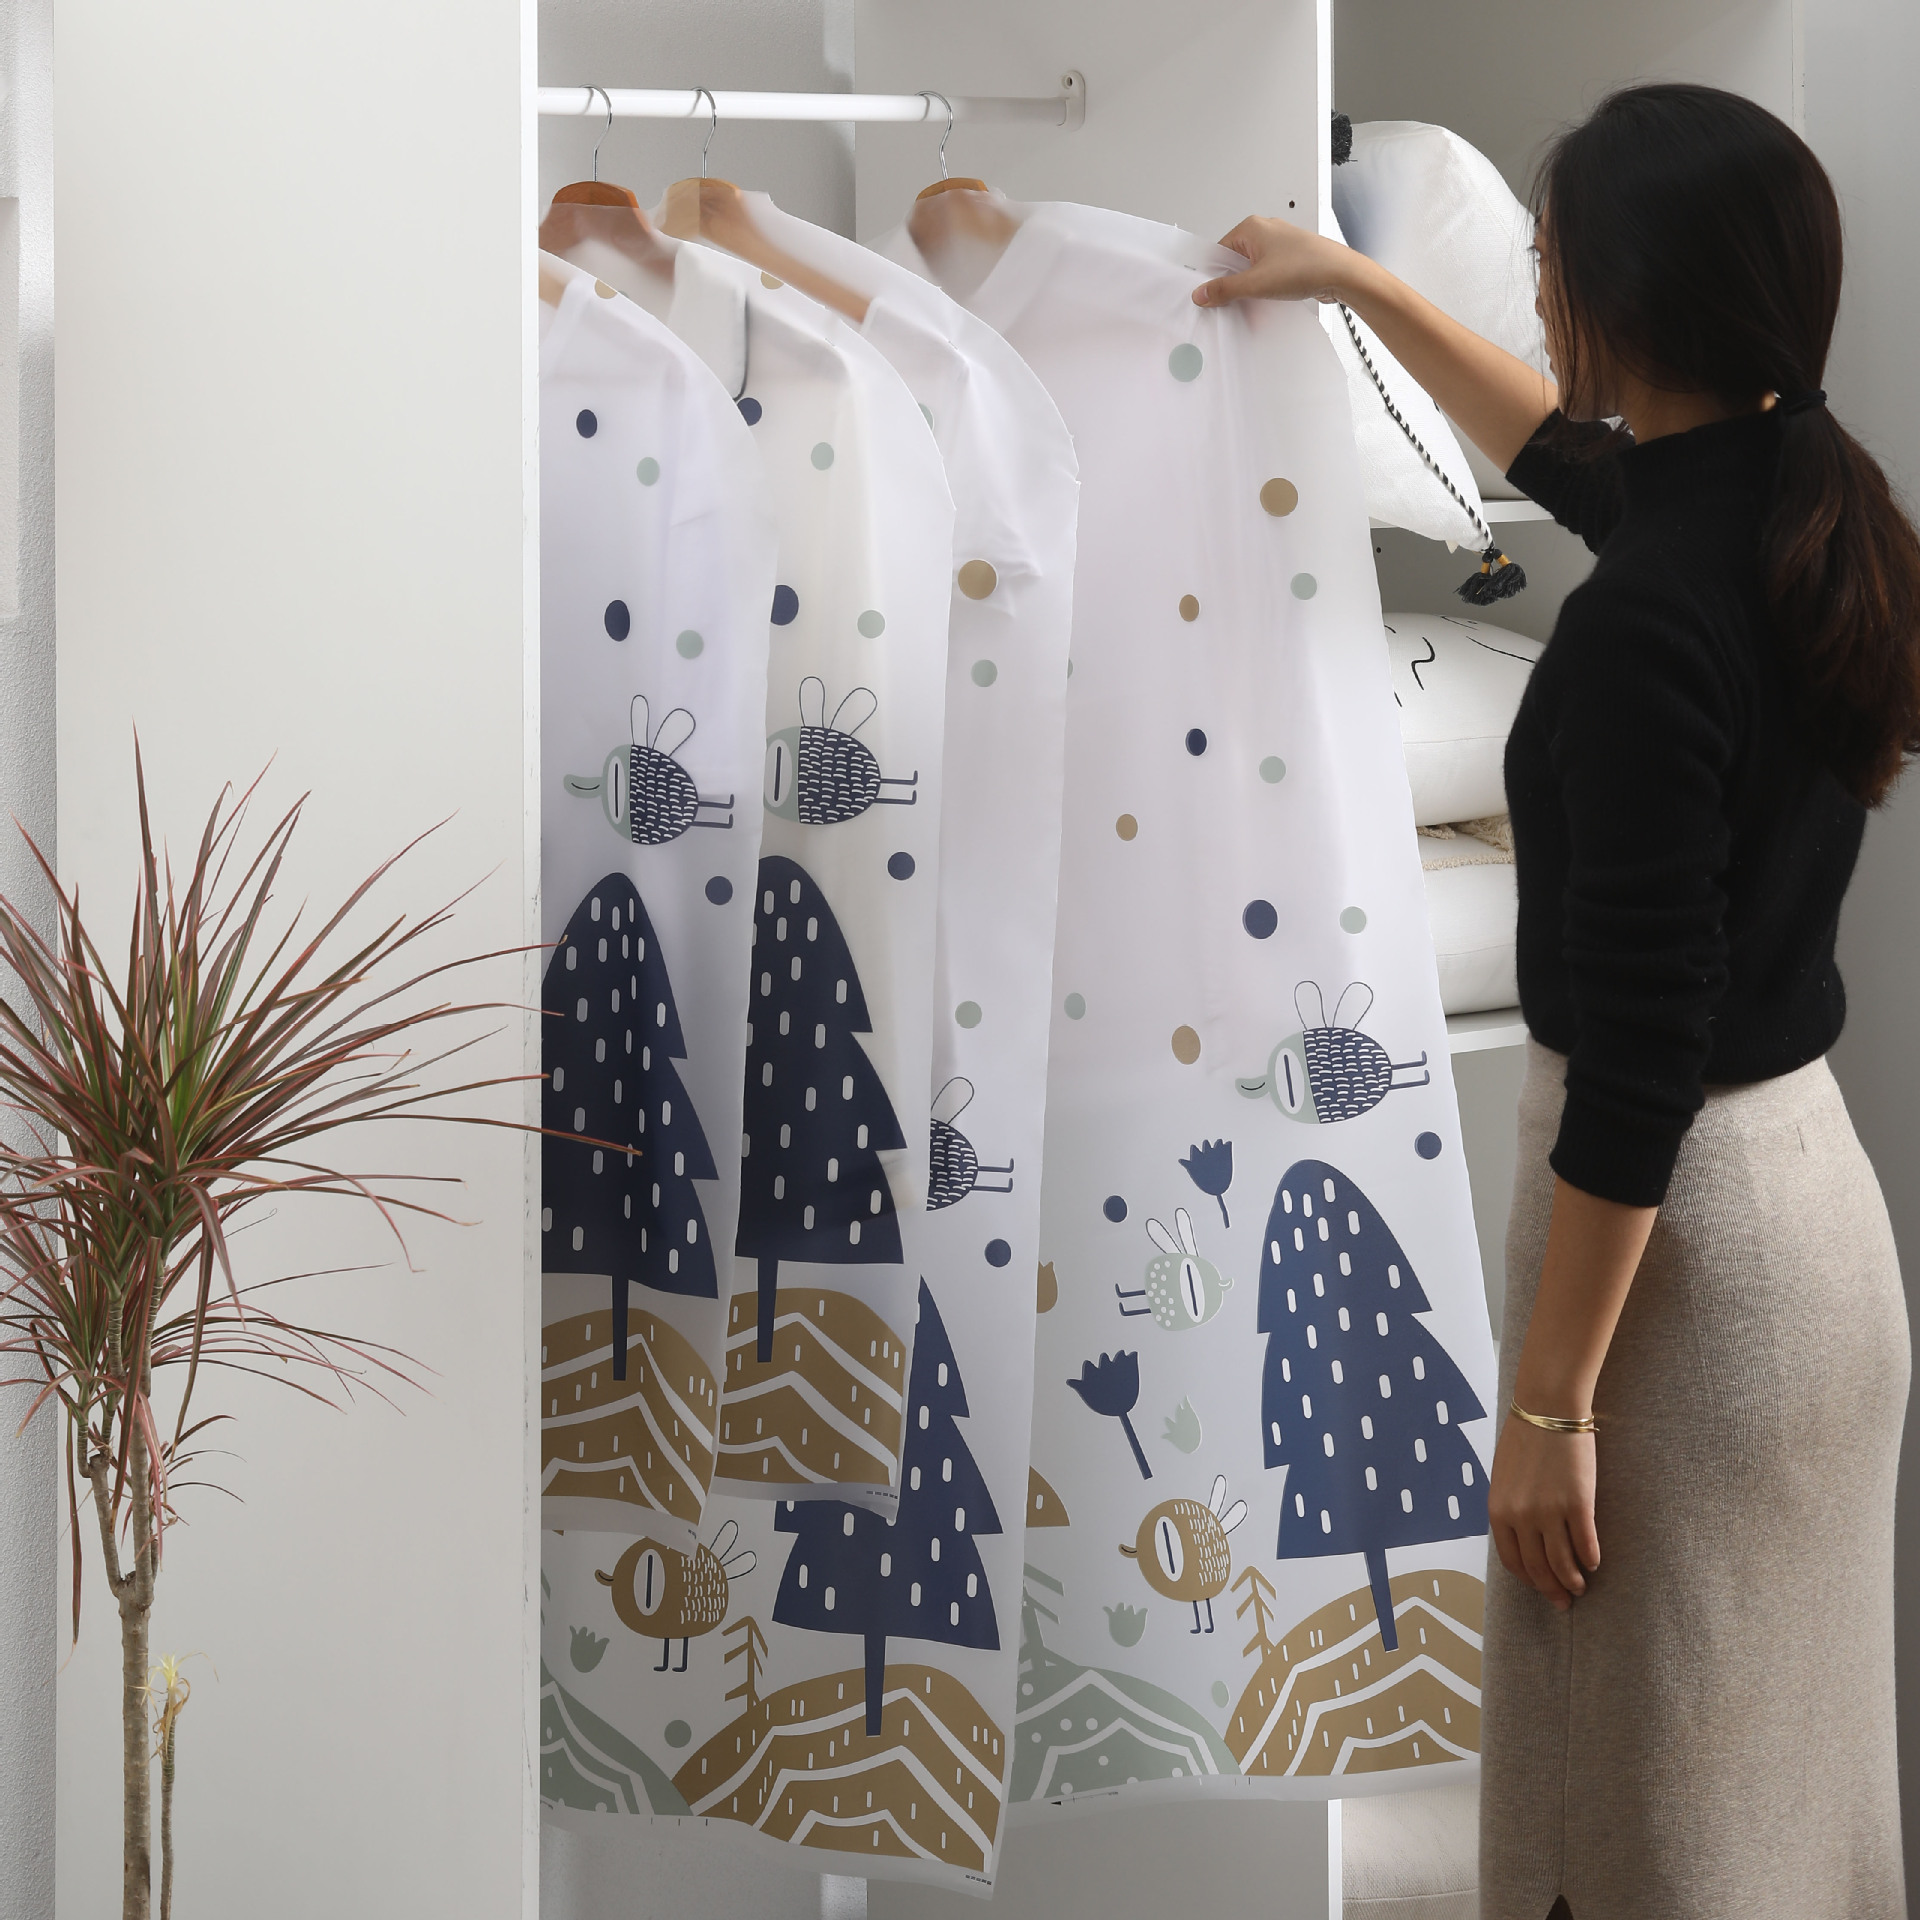 2pcs/set PEVA Printing Waterproof Suit Cover Coat Dust Cover Clothing Suit Dust Bag